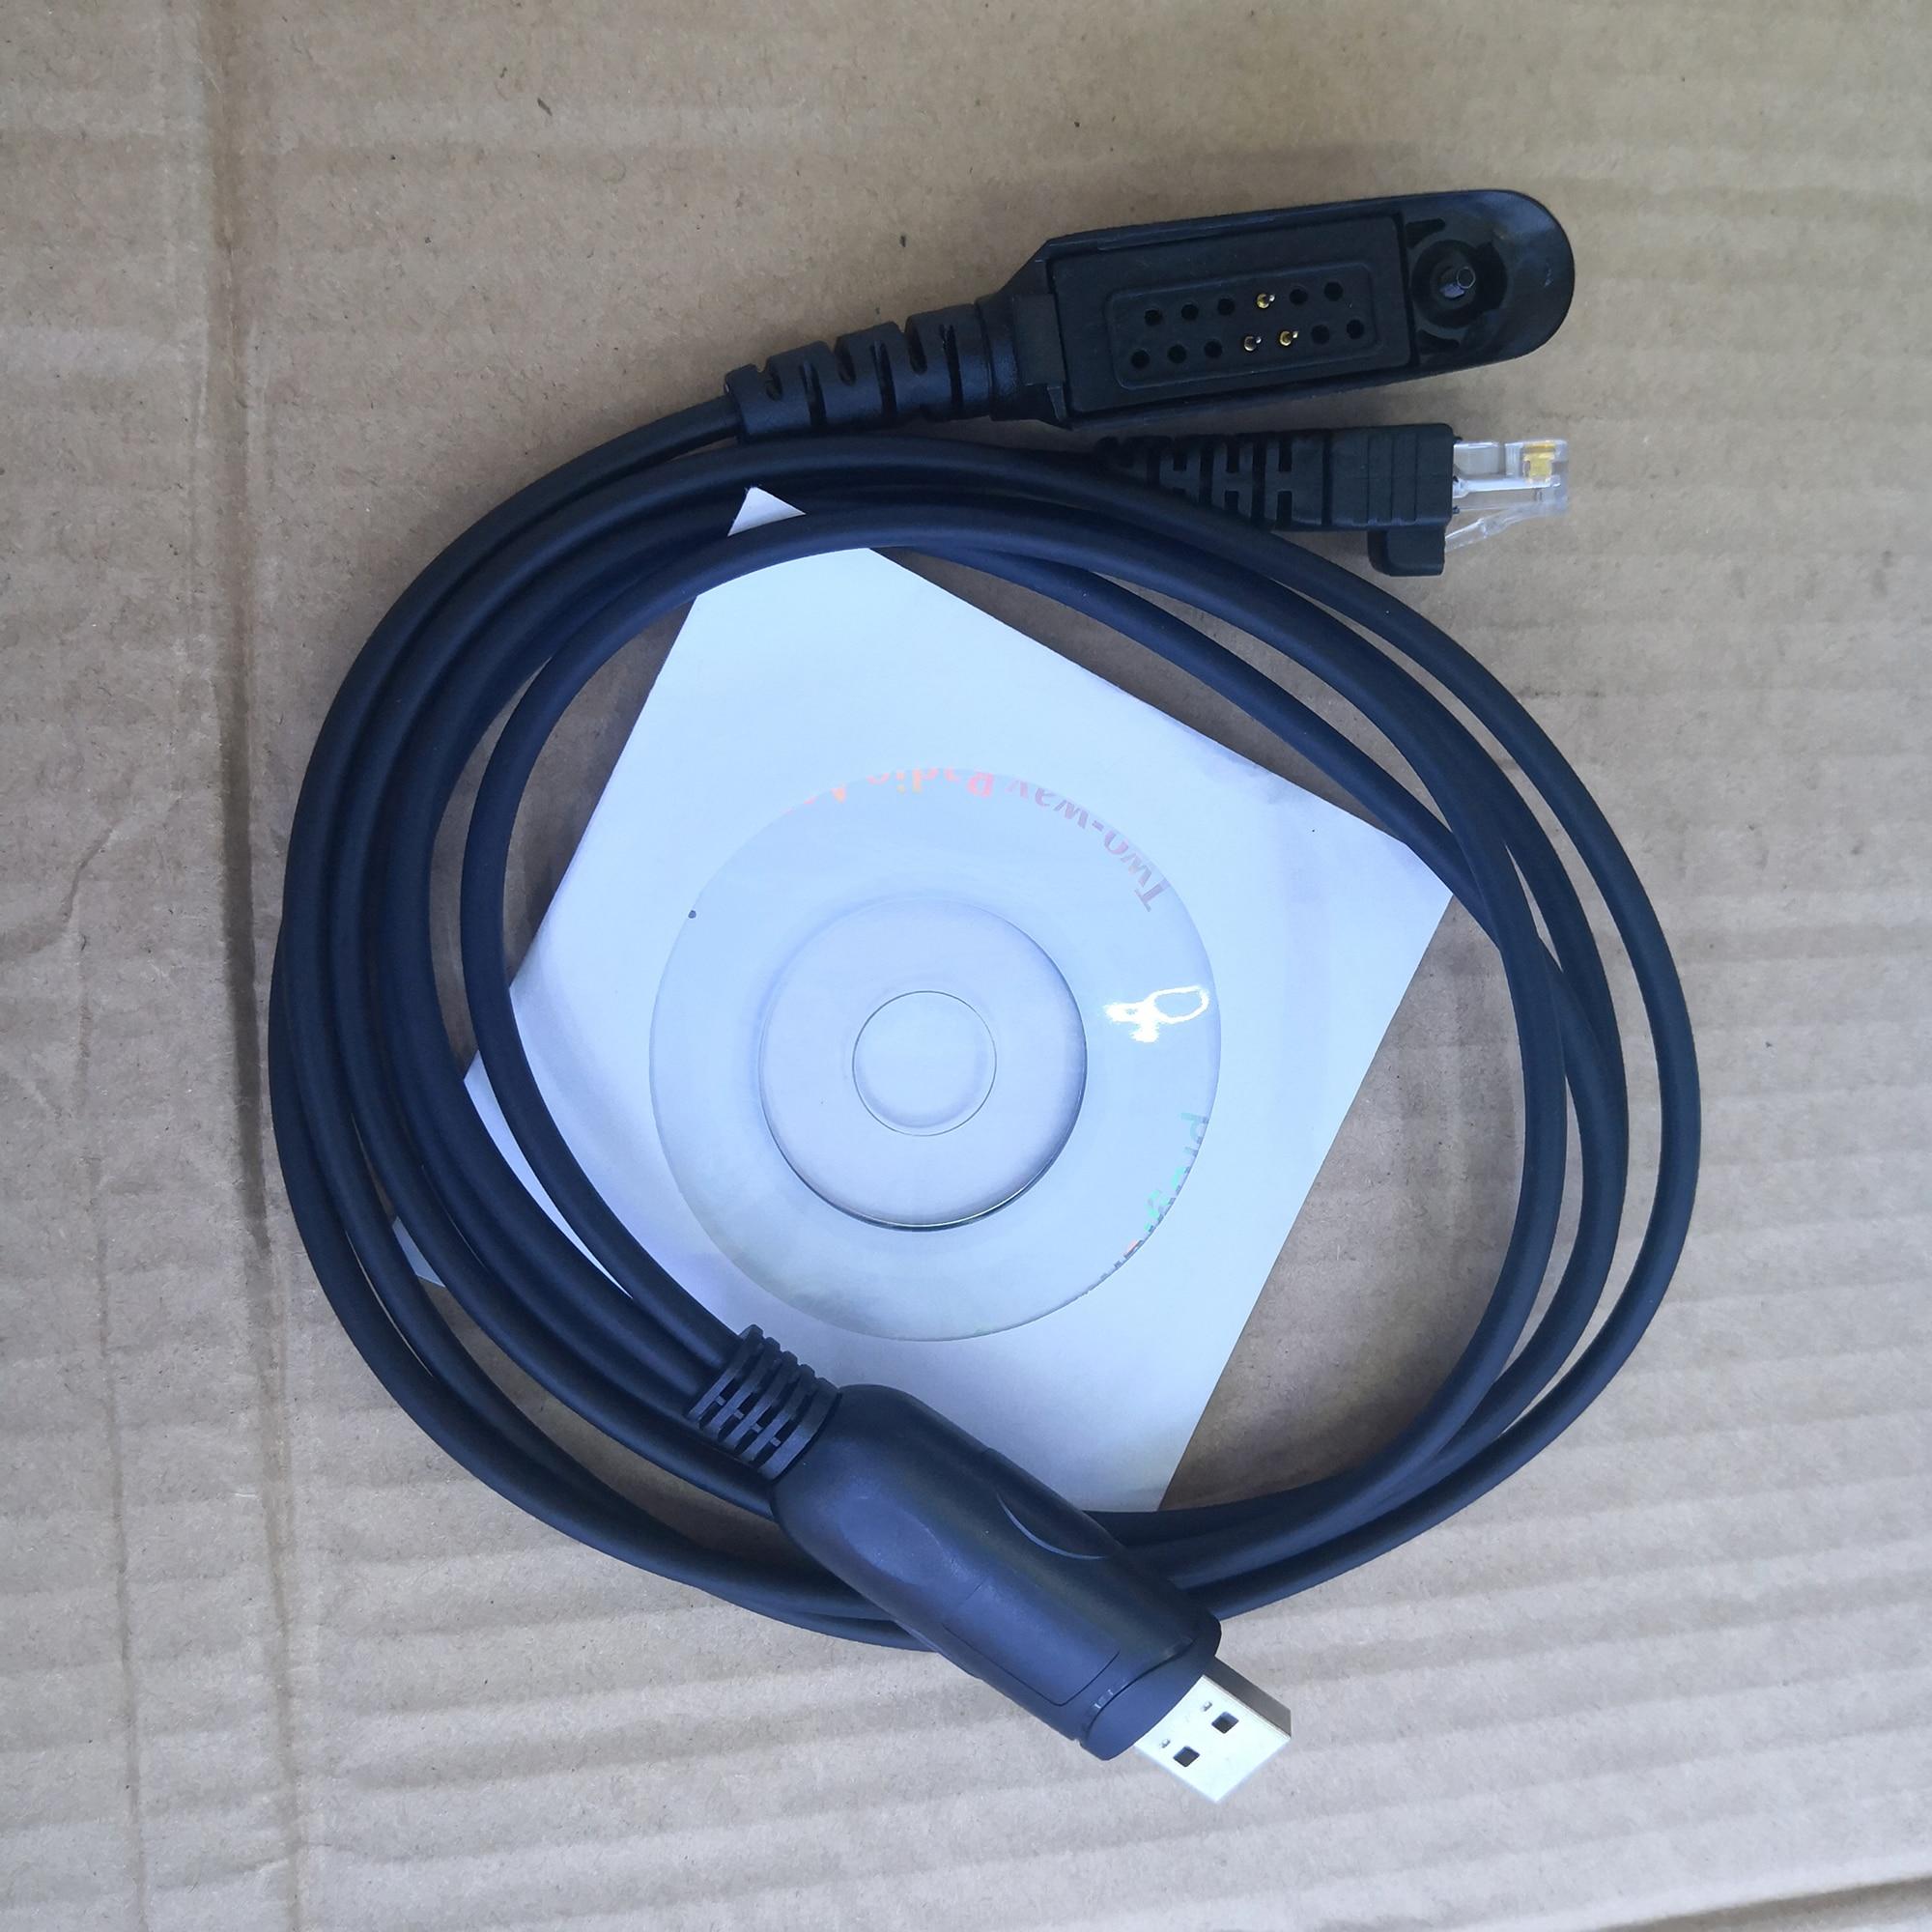 2 In 1 Muilt-function USB Programming Cable For Motorola Gp328,gp338,gp340 PRO5150 Walkie Talkie GM338,GM3188,etc Car Radio